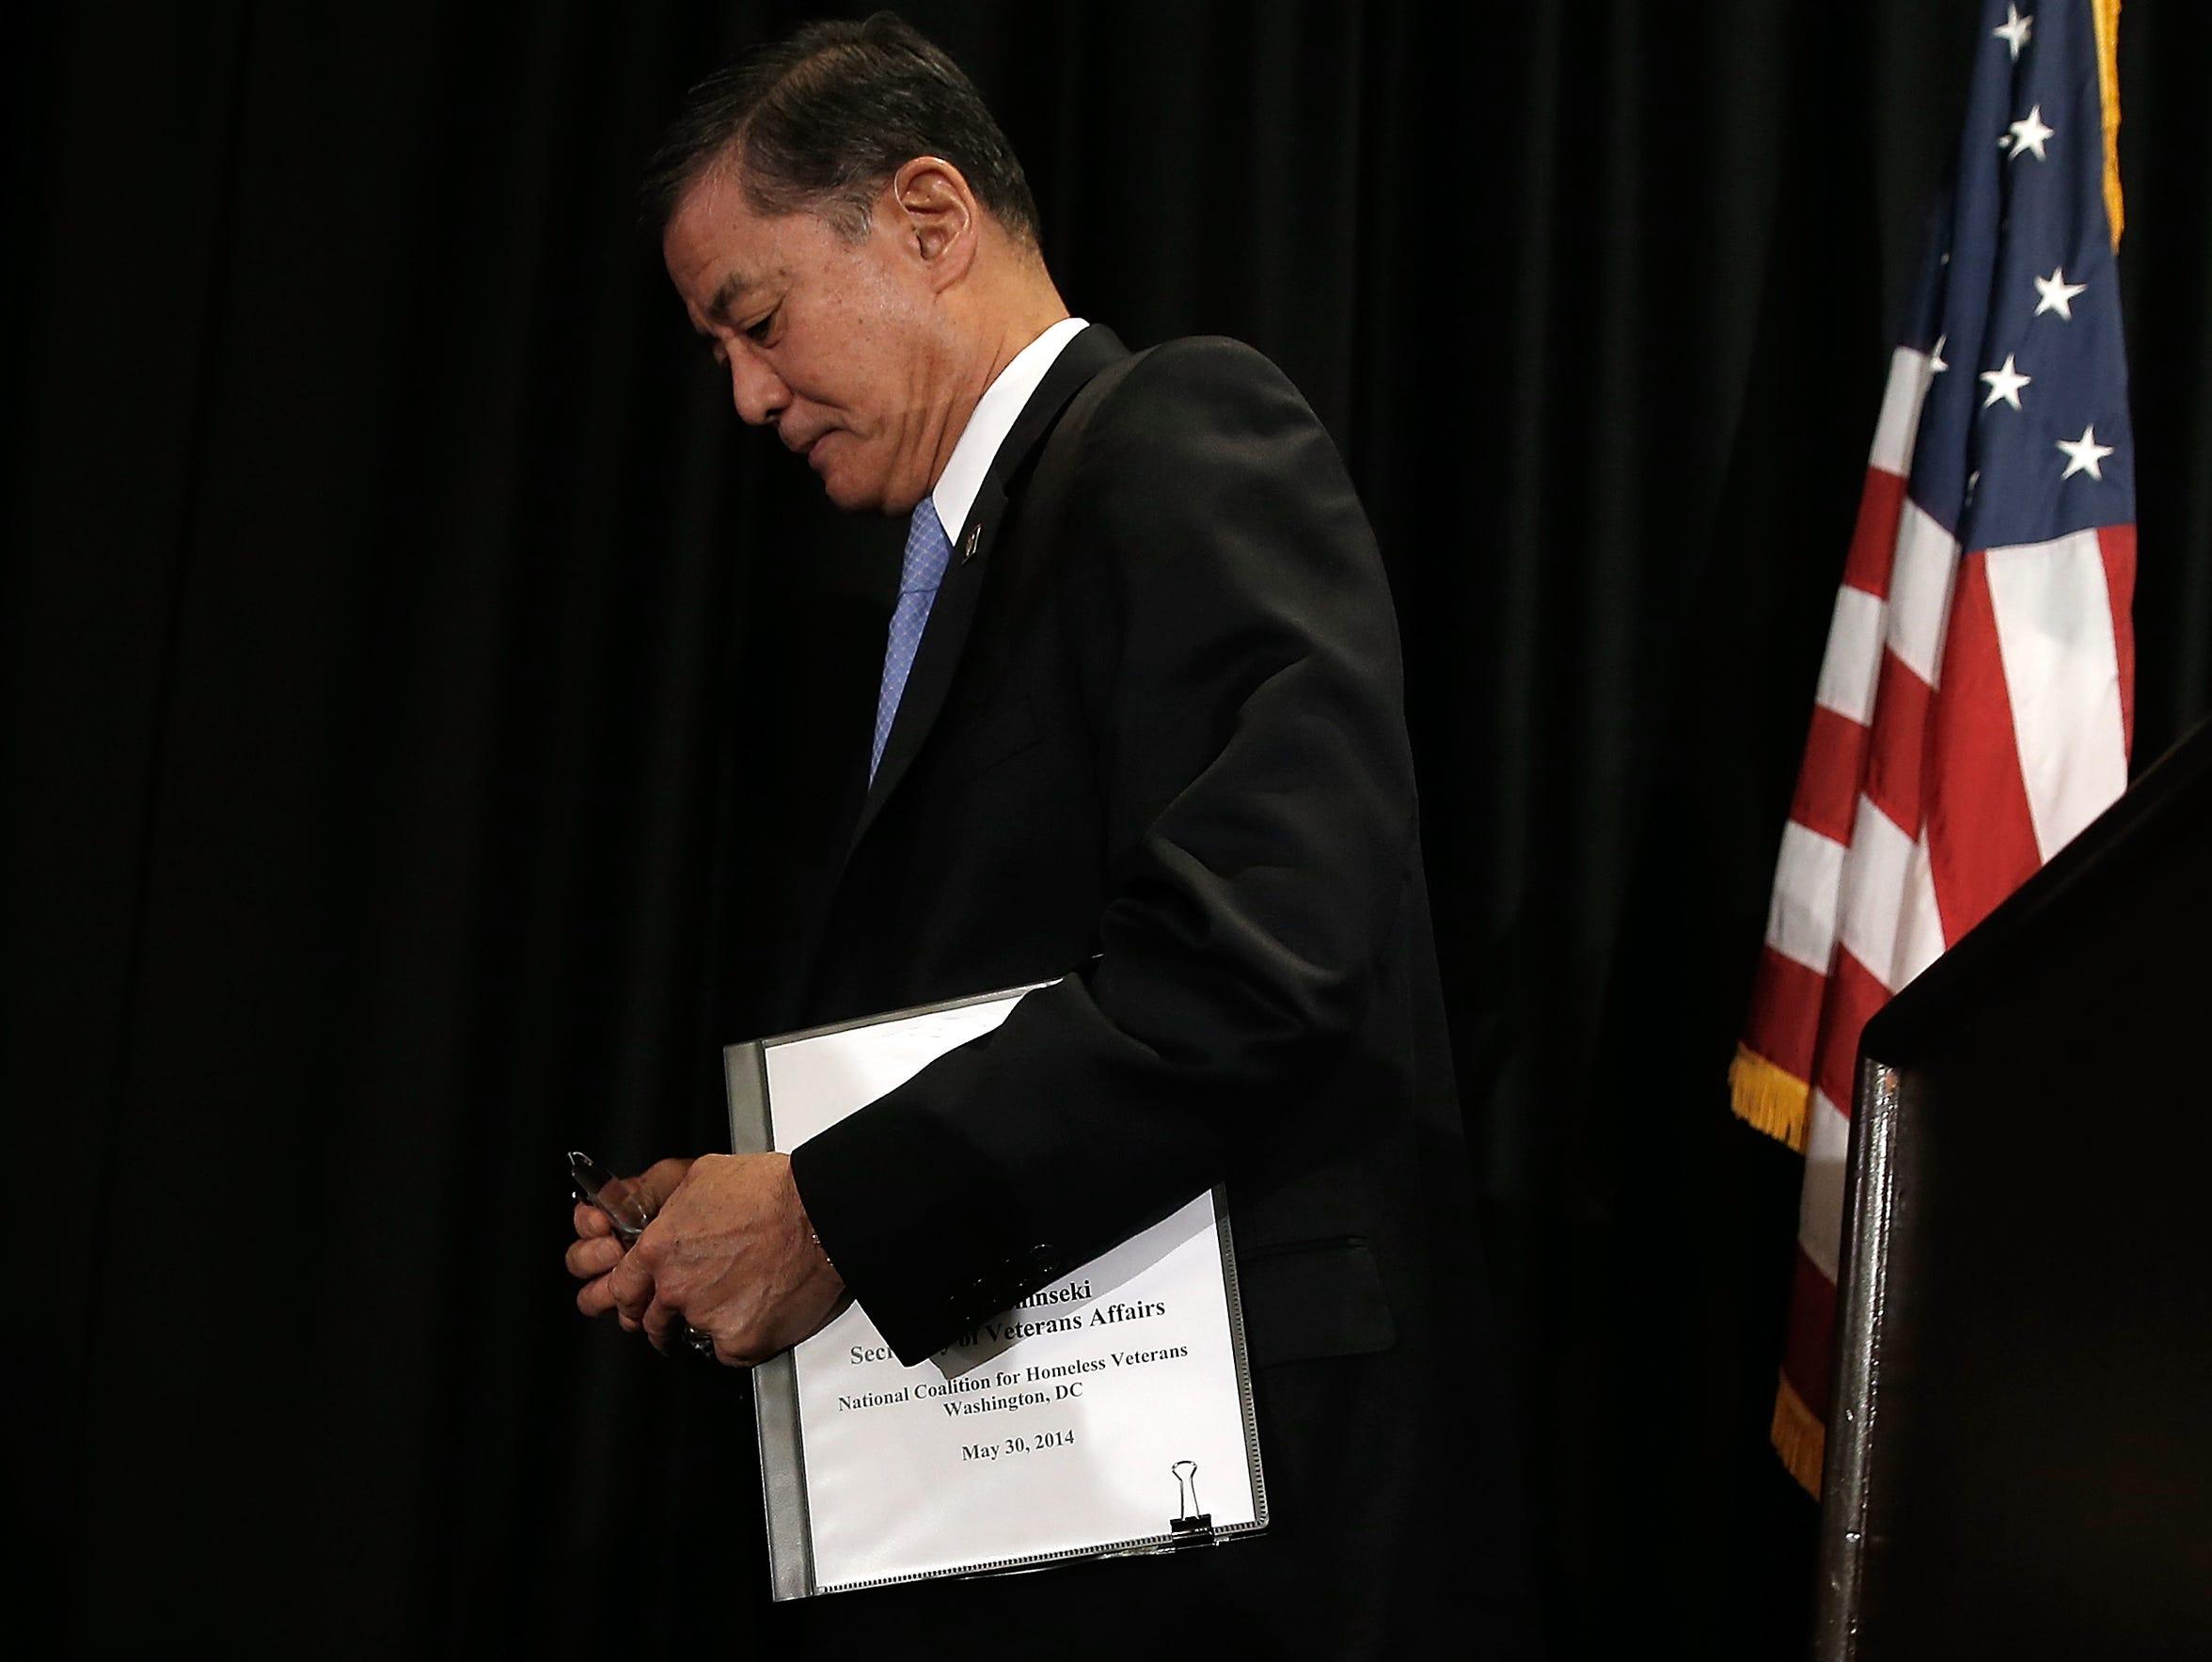 VA Secretary Eric Shinseki